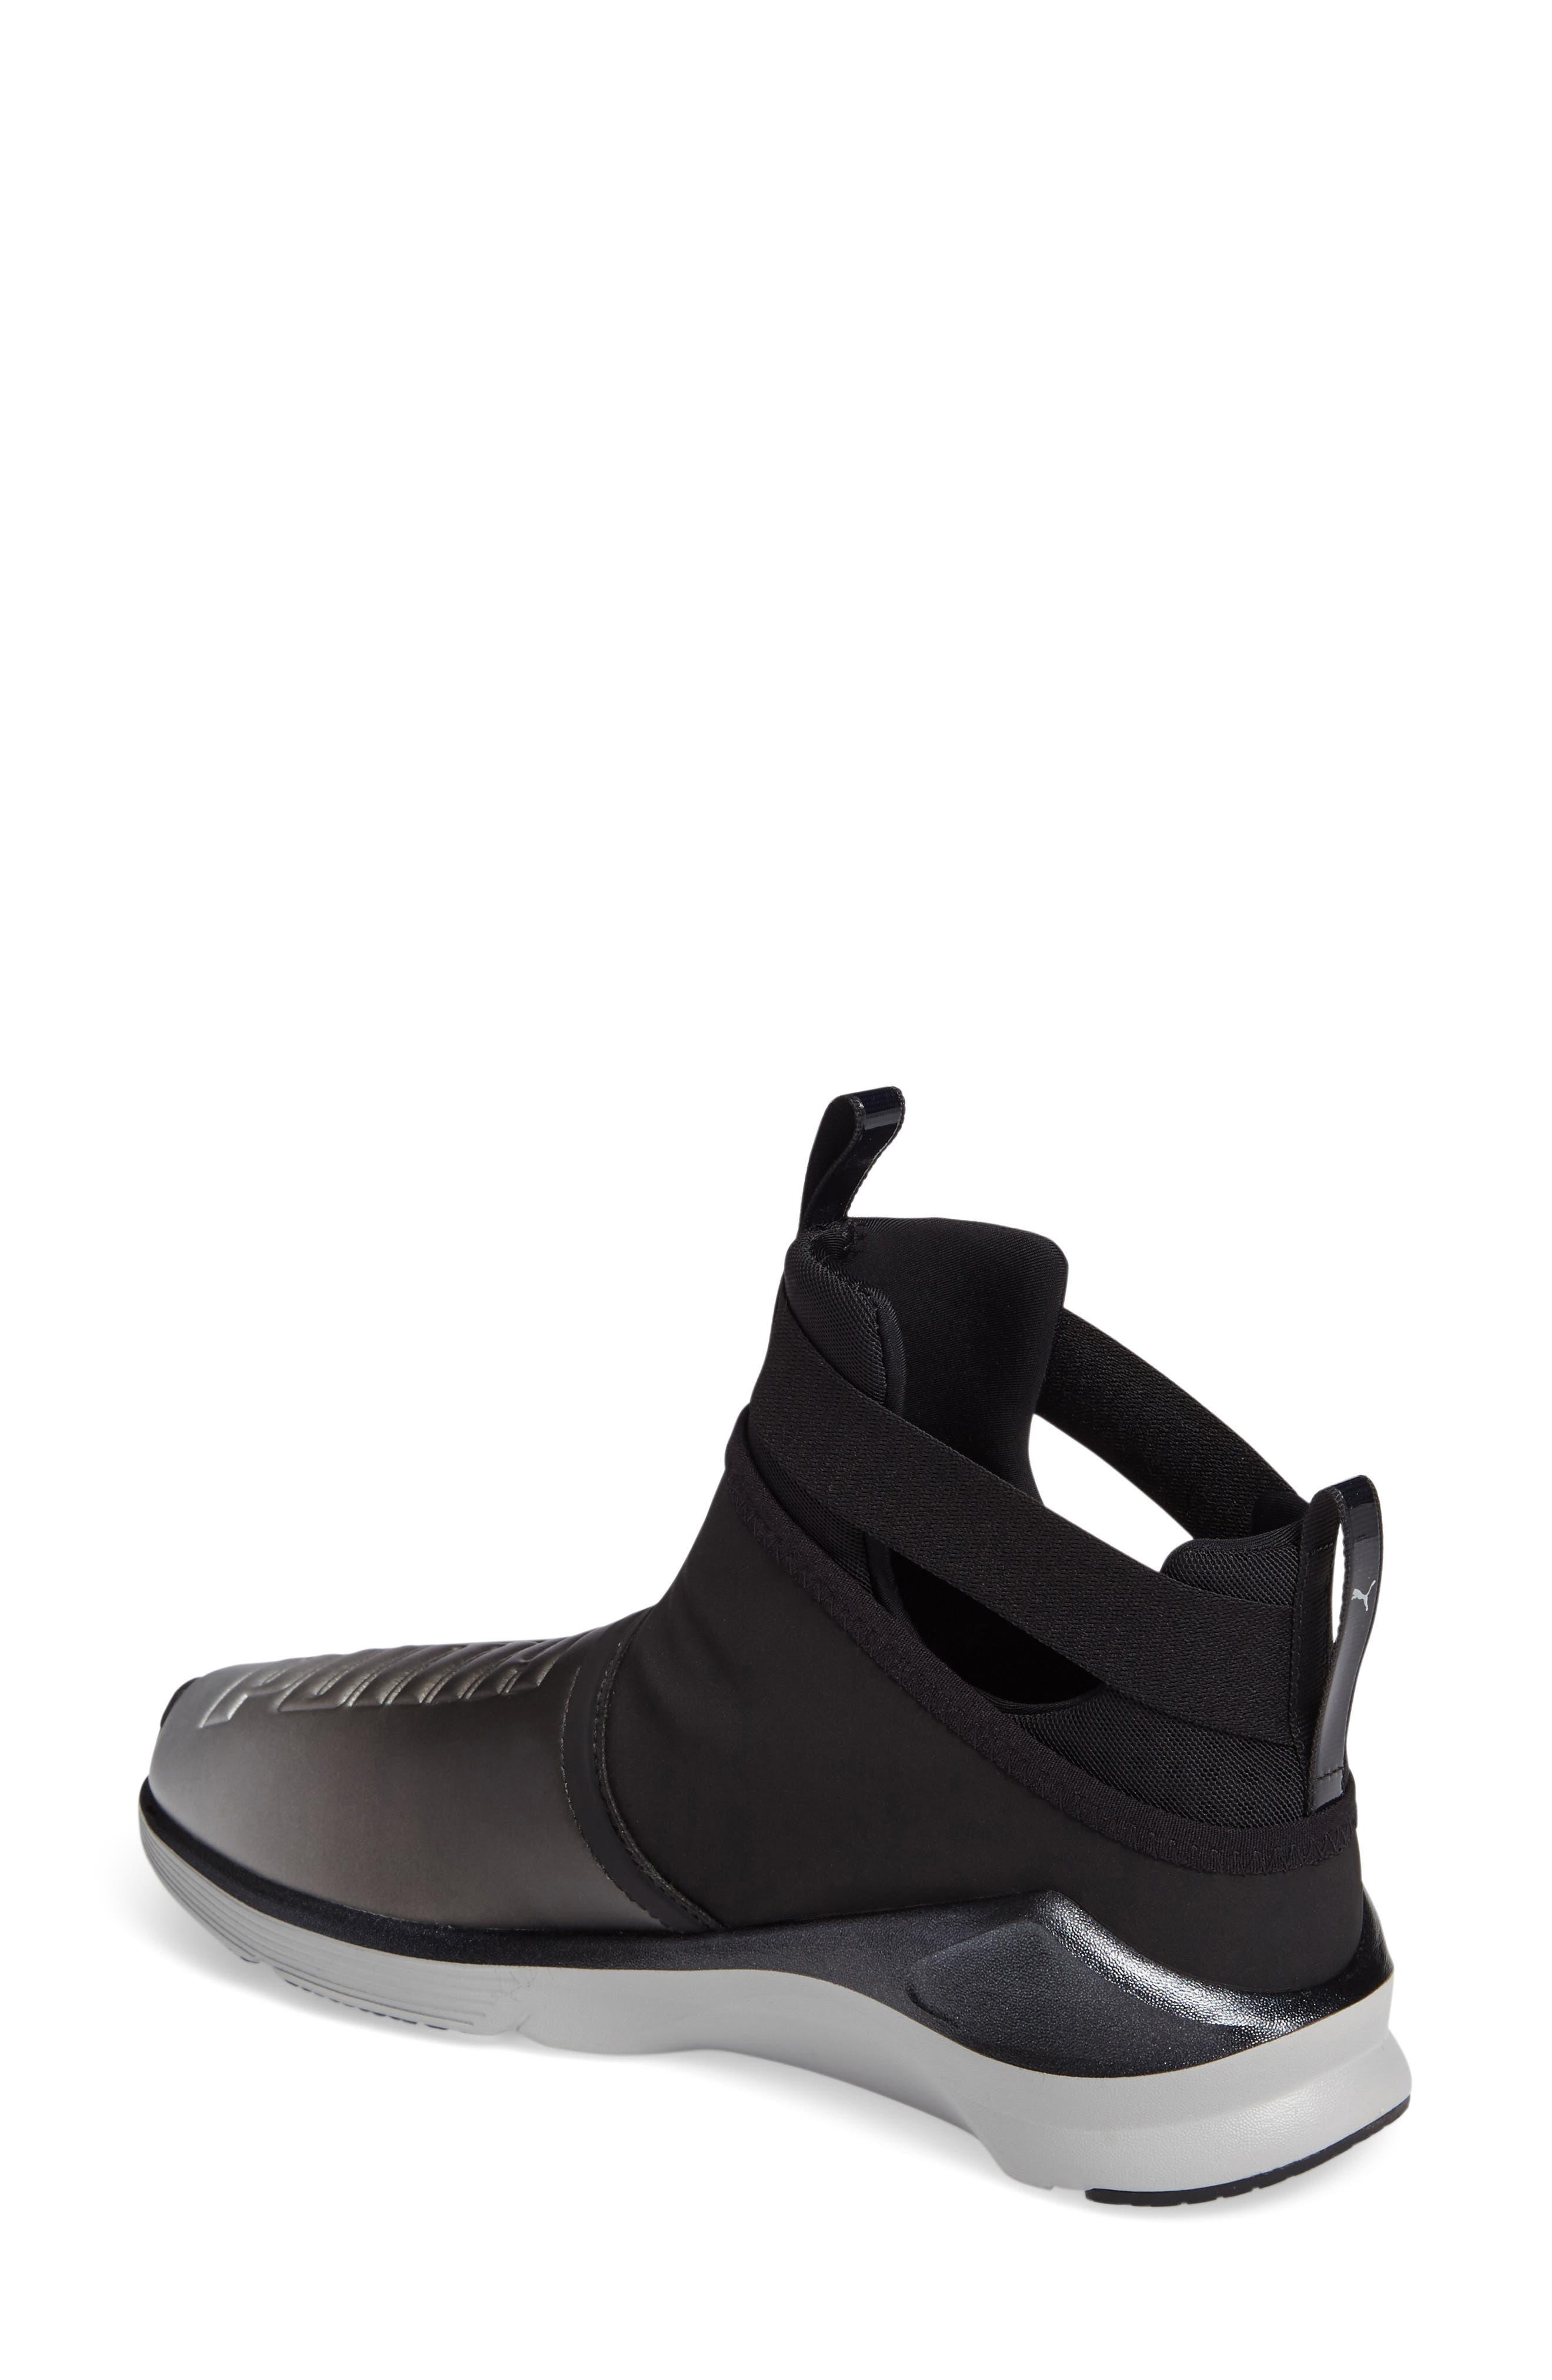 Alternate Image 2  - PUMA Fierce High Top Sneaker (Women)